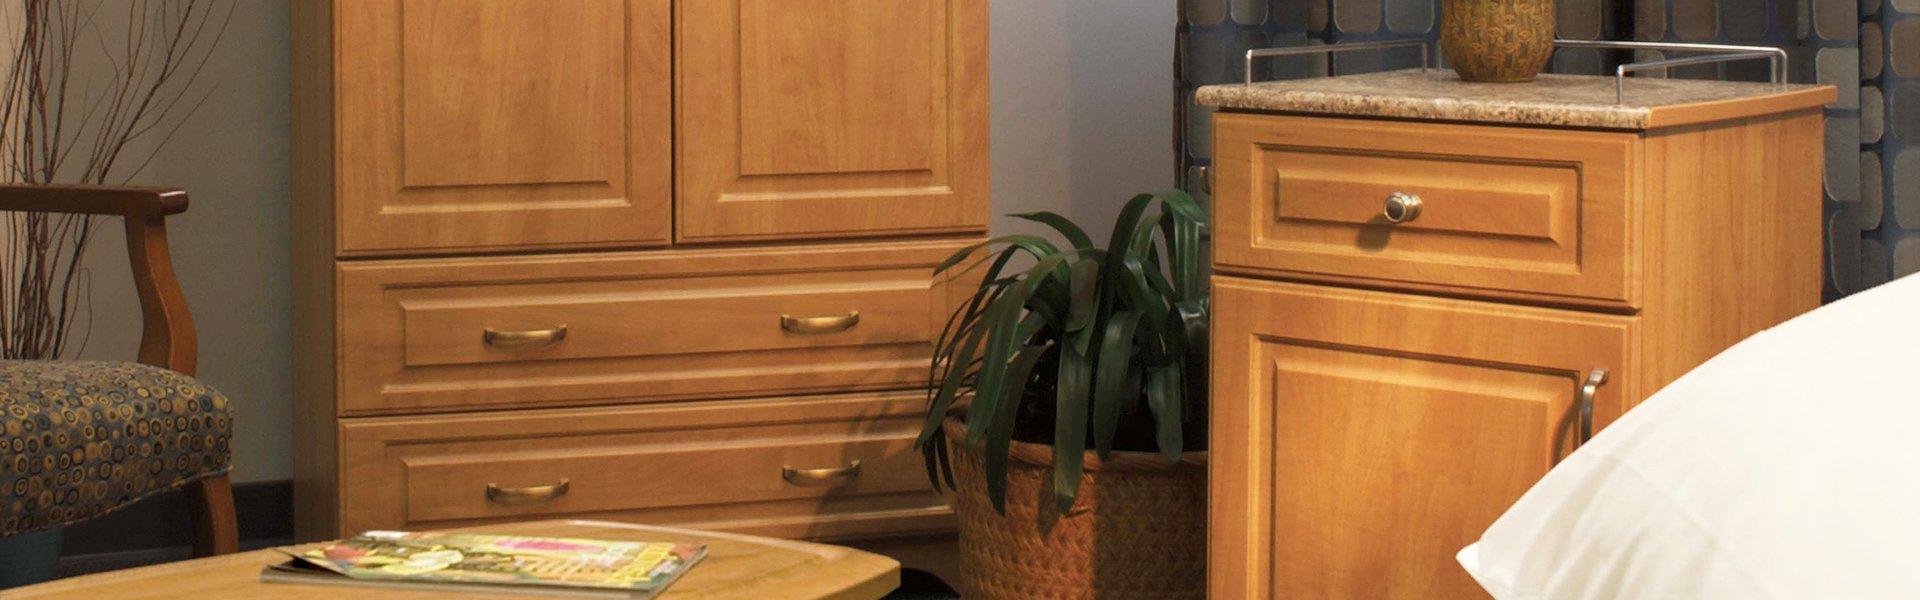 Corilam Dresser setting